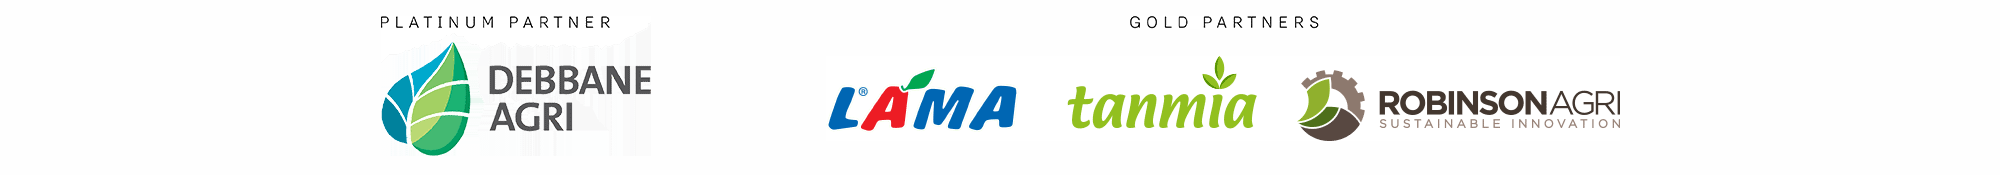 sponsors logo strip